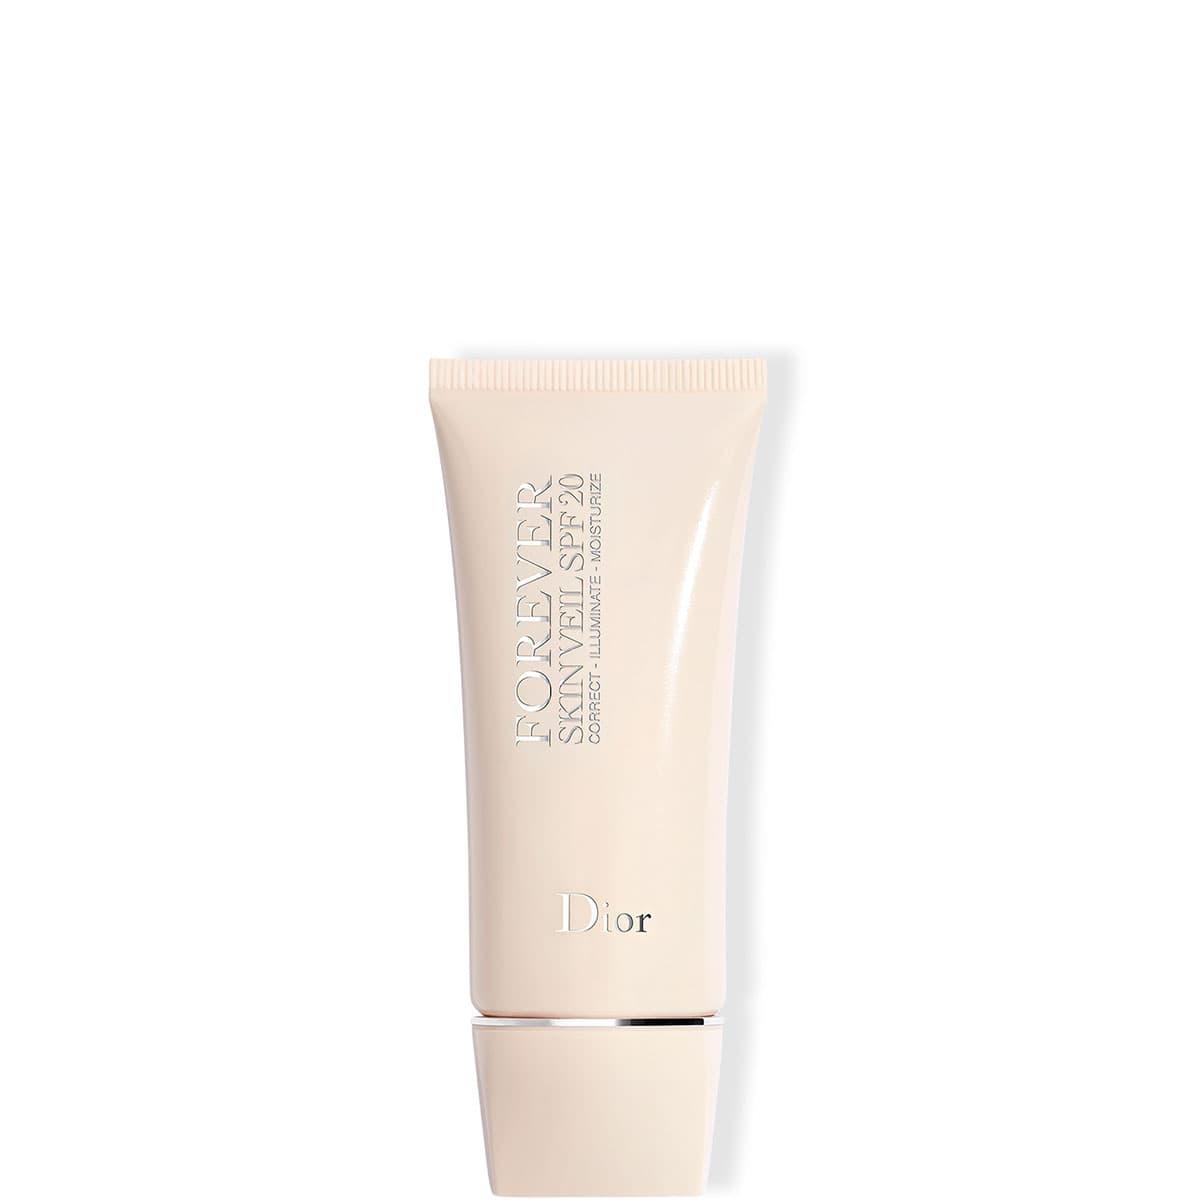 Base de teint Dior Forever Skin Veil SPF 20